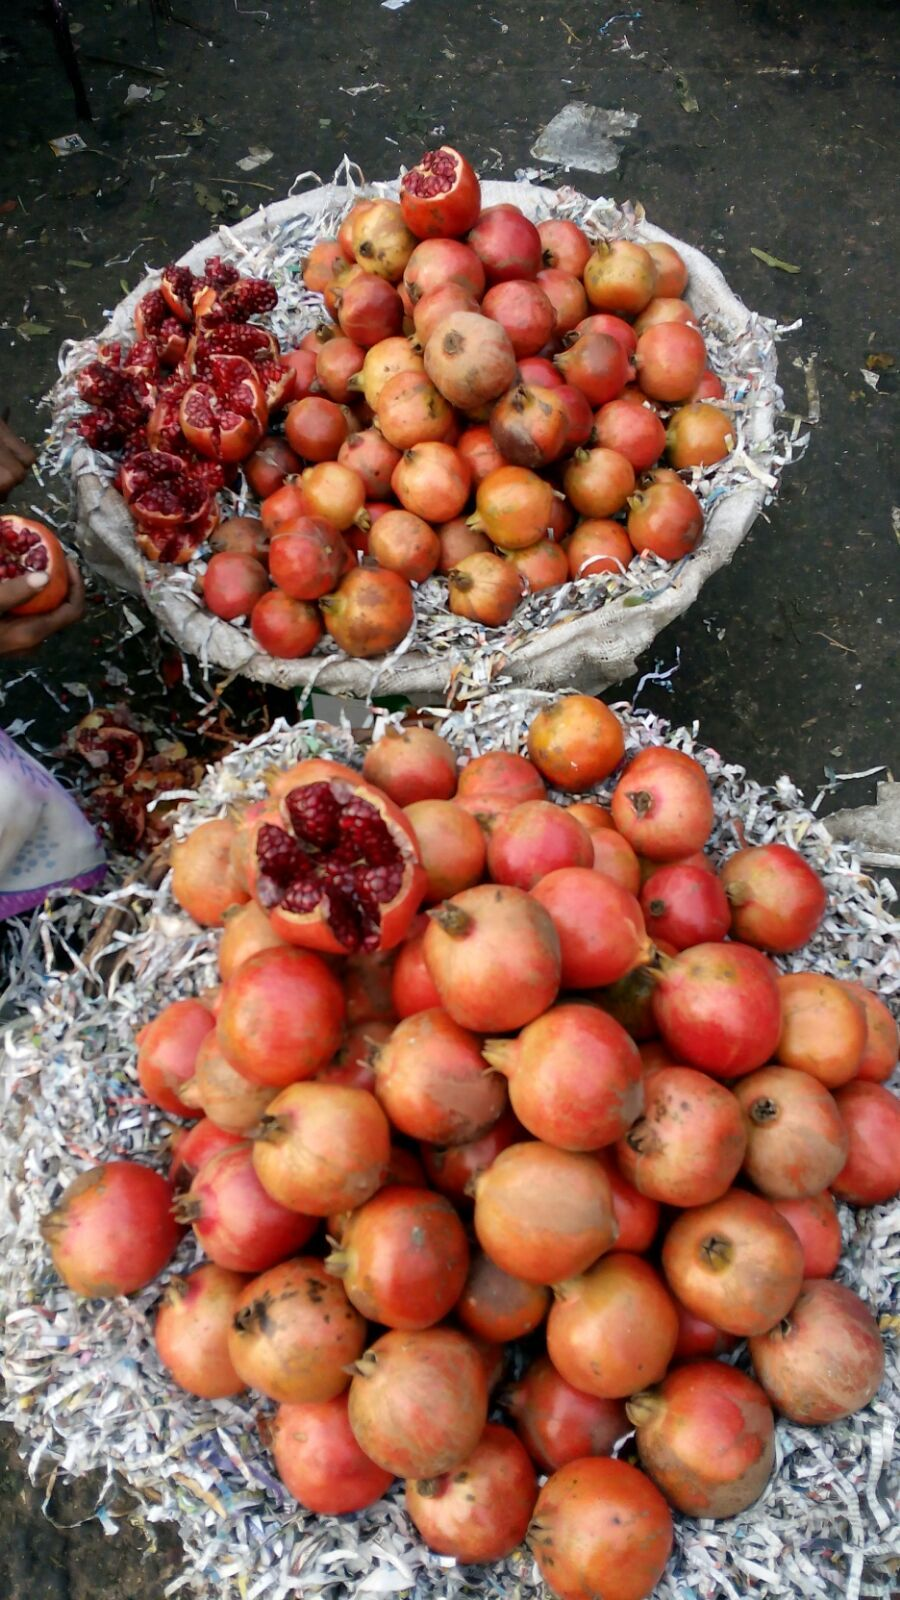 Azadpur Subzi Mandi Delhi Biggest Fruit and Vegetable Market in